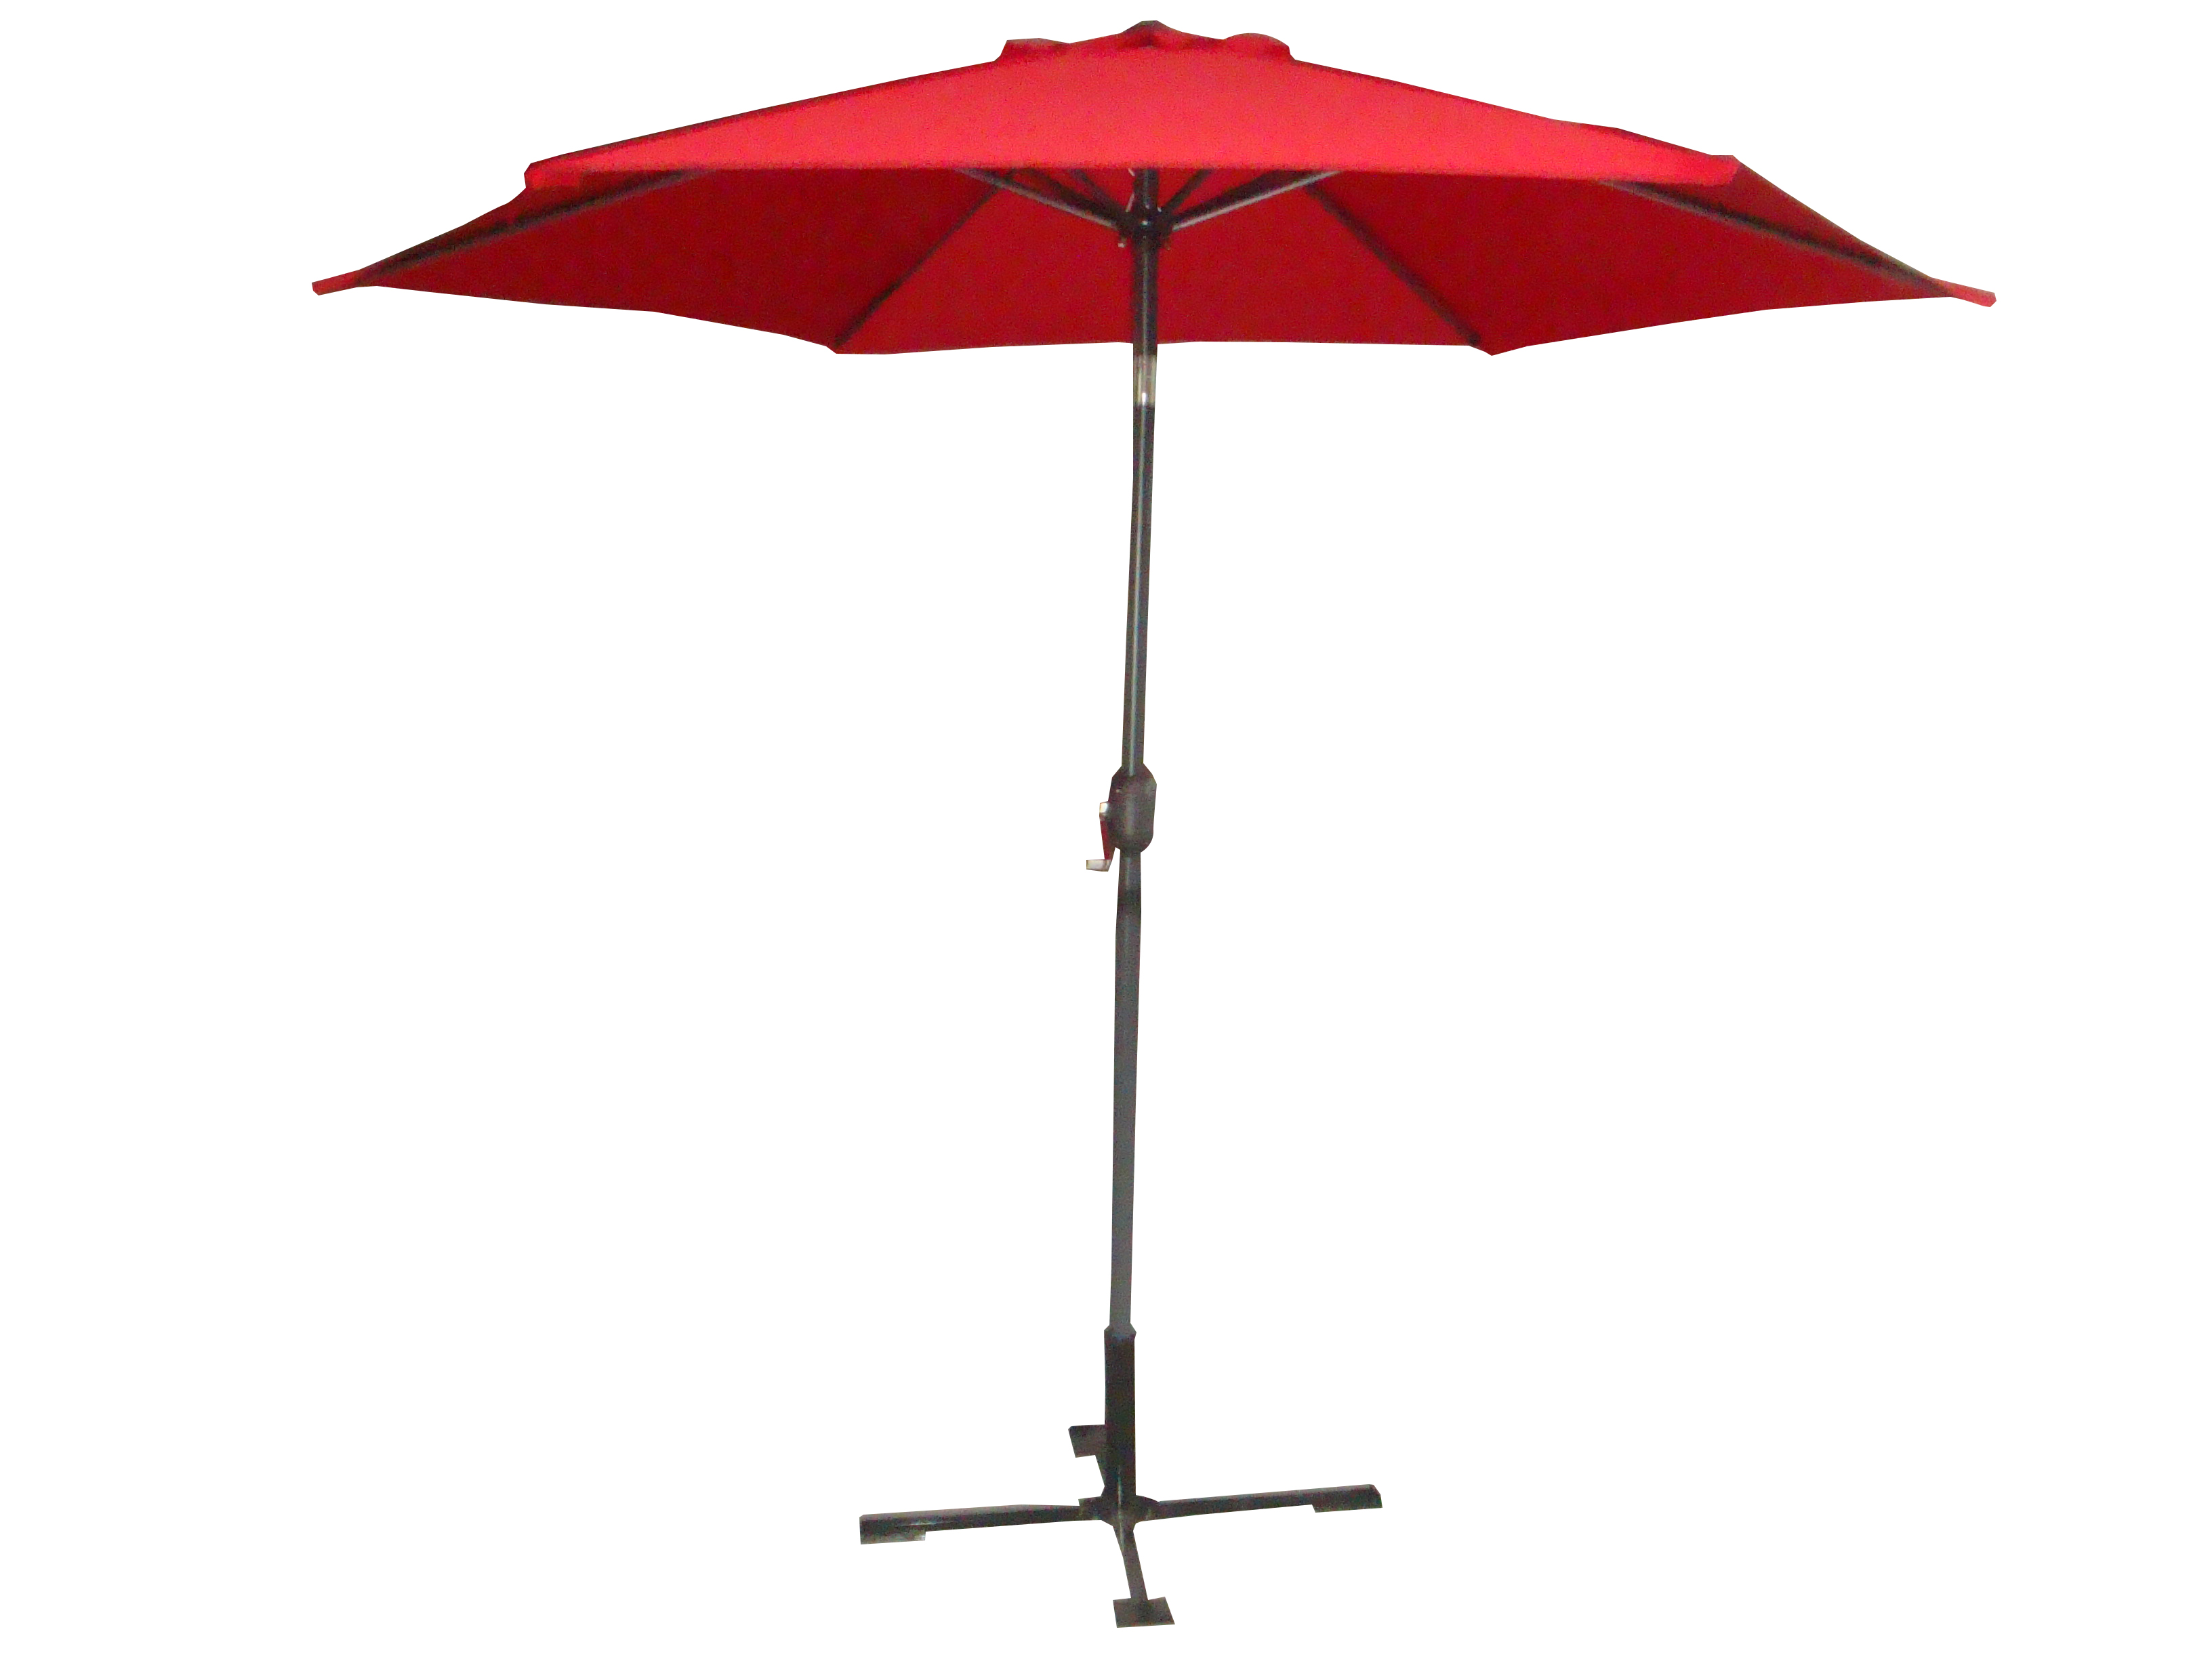 9ft patio umbrella new 9ft aluminum outdoor patio. Black Bedroom Furniture Sets. Home Design Ideas